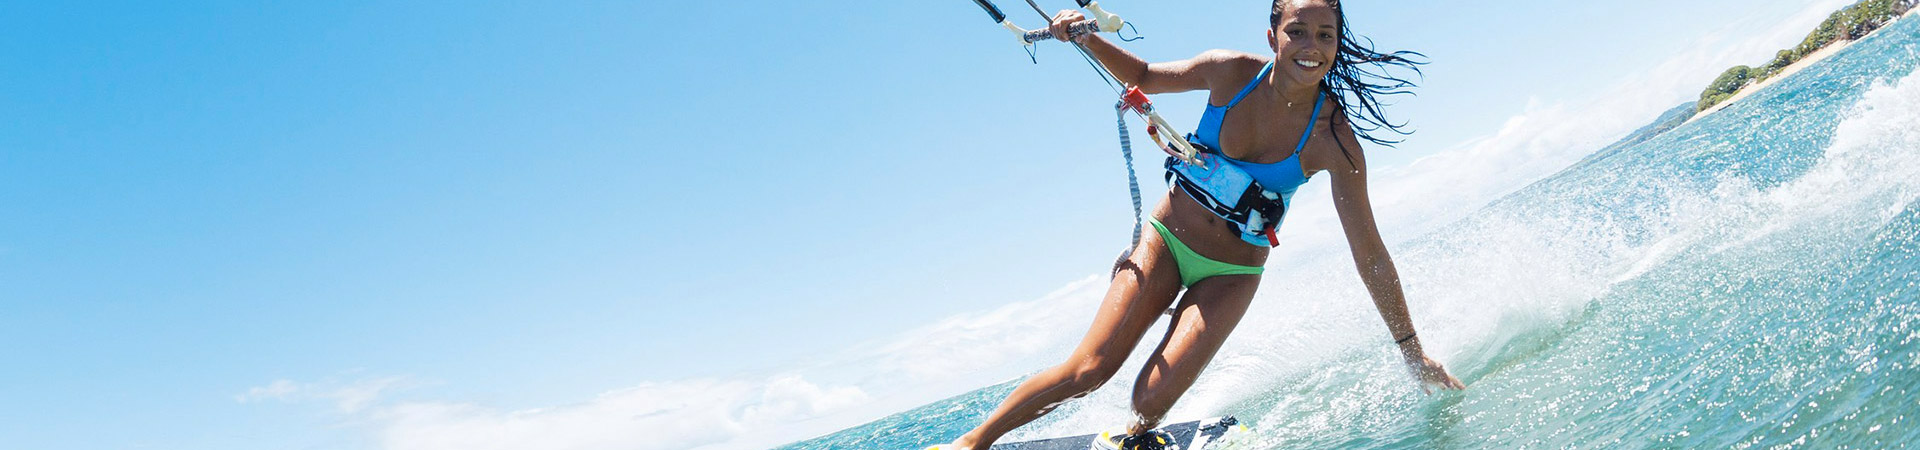 wakeboard-camping-merendella